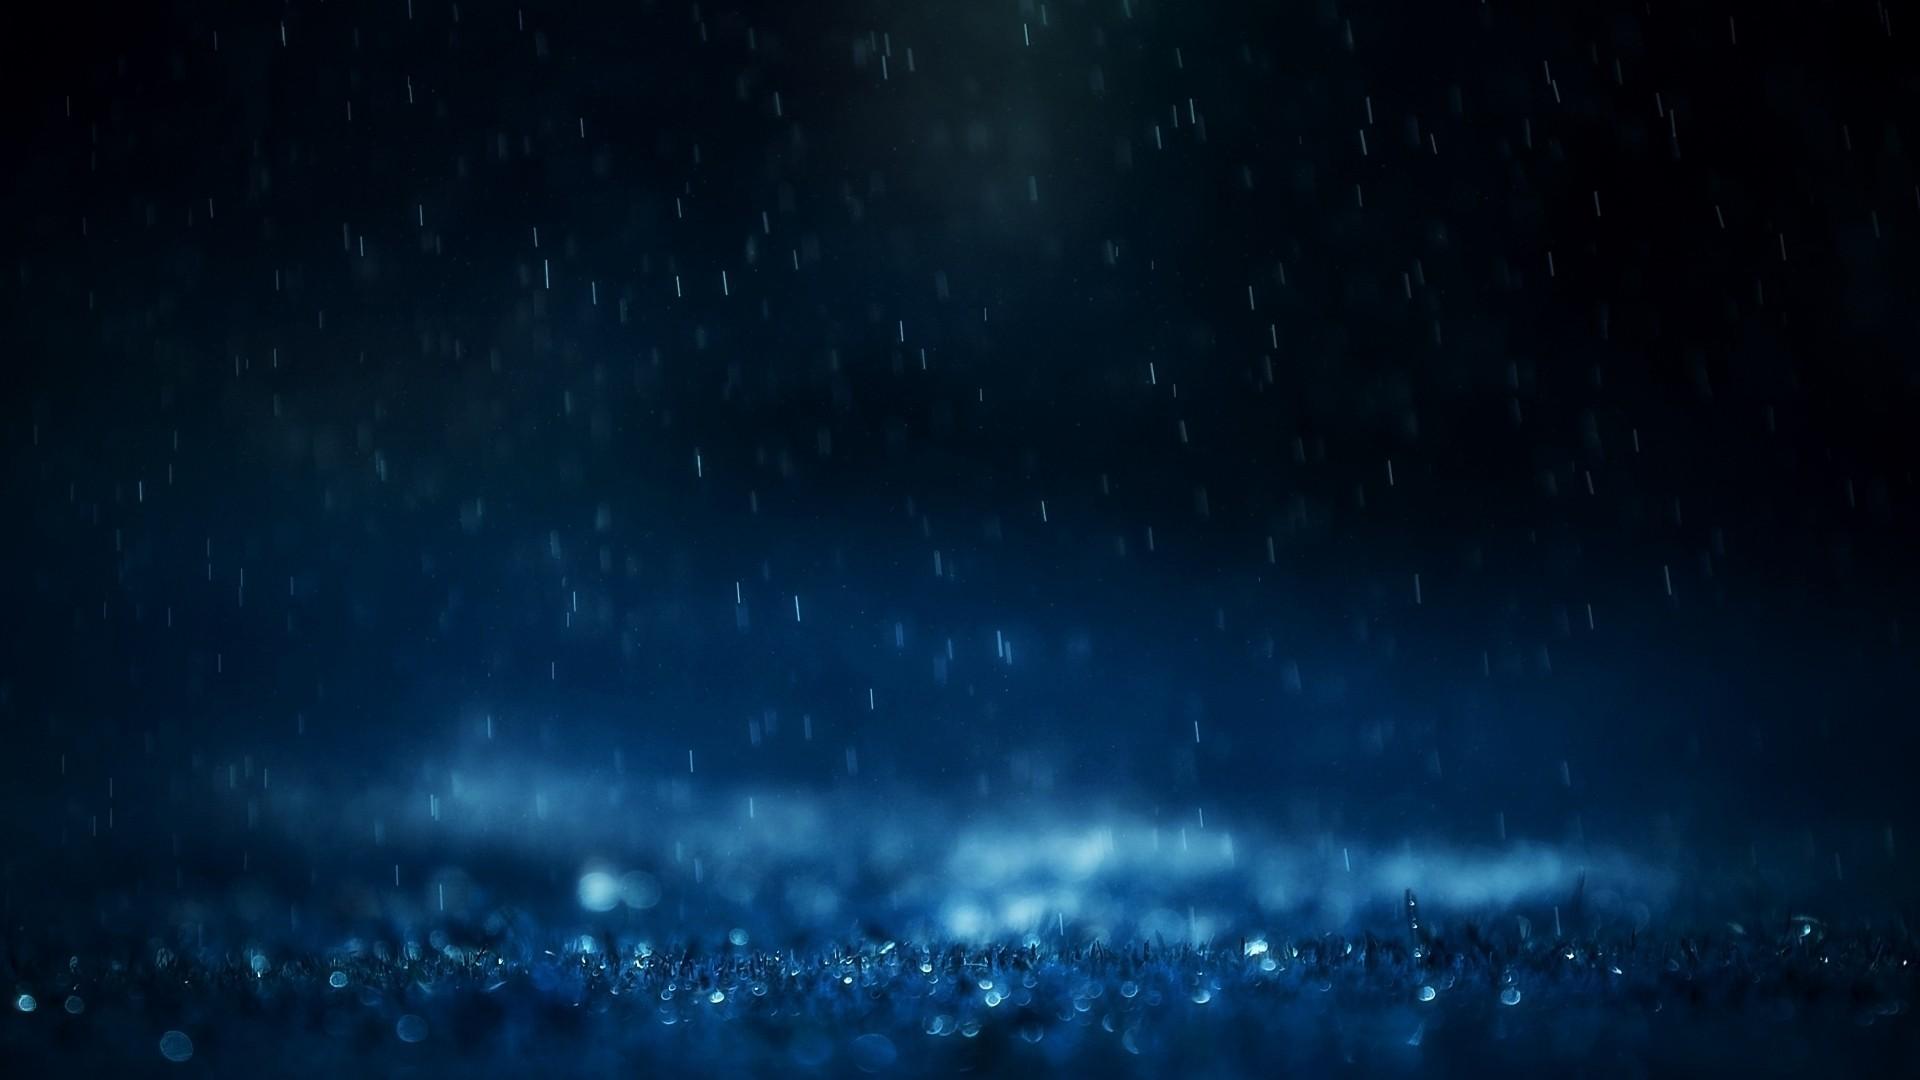 Blue Rain Wallpaper 1920x1080 Blue Rain Monochrome Ground 1920x1080